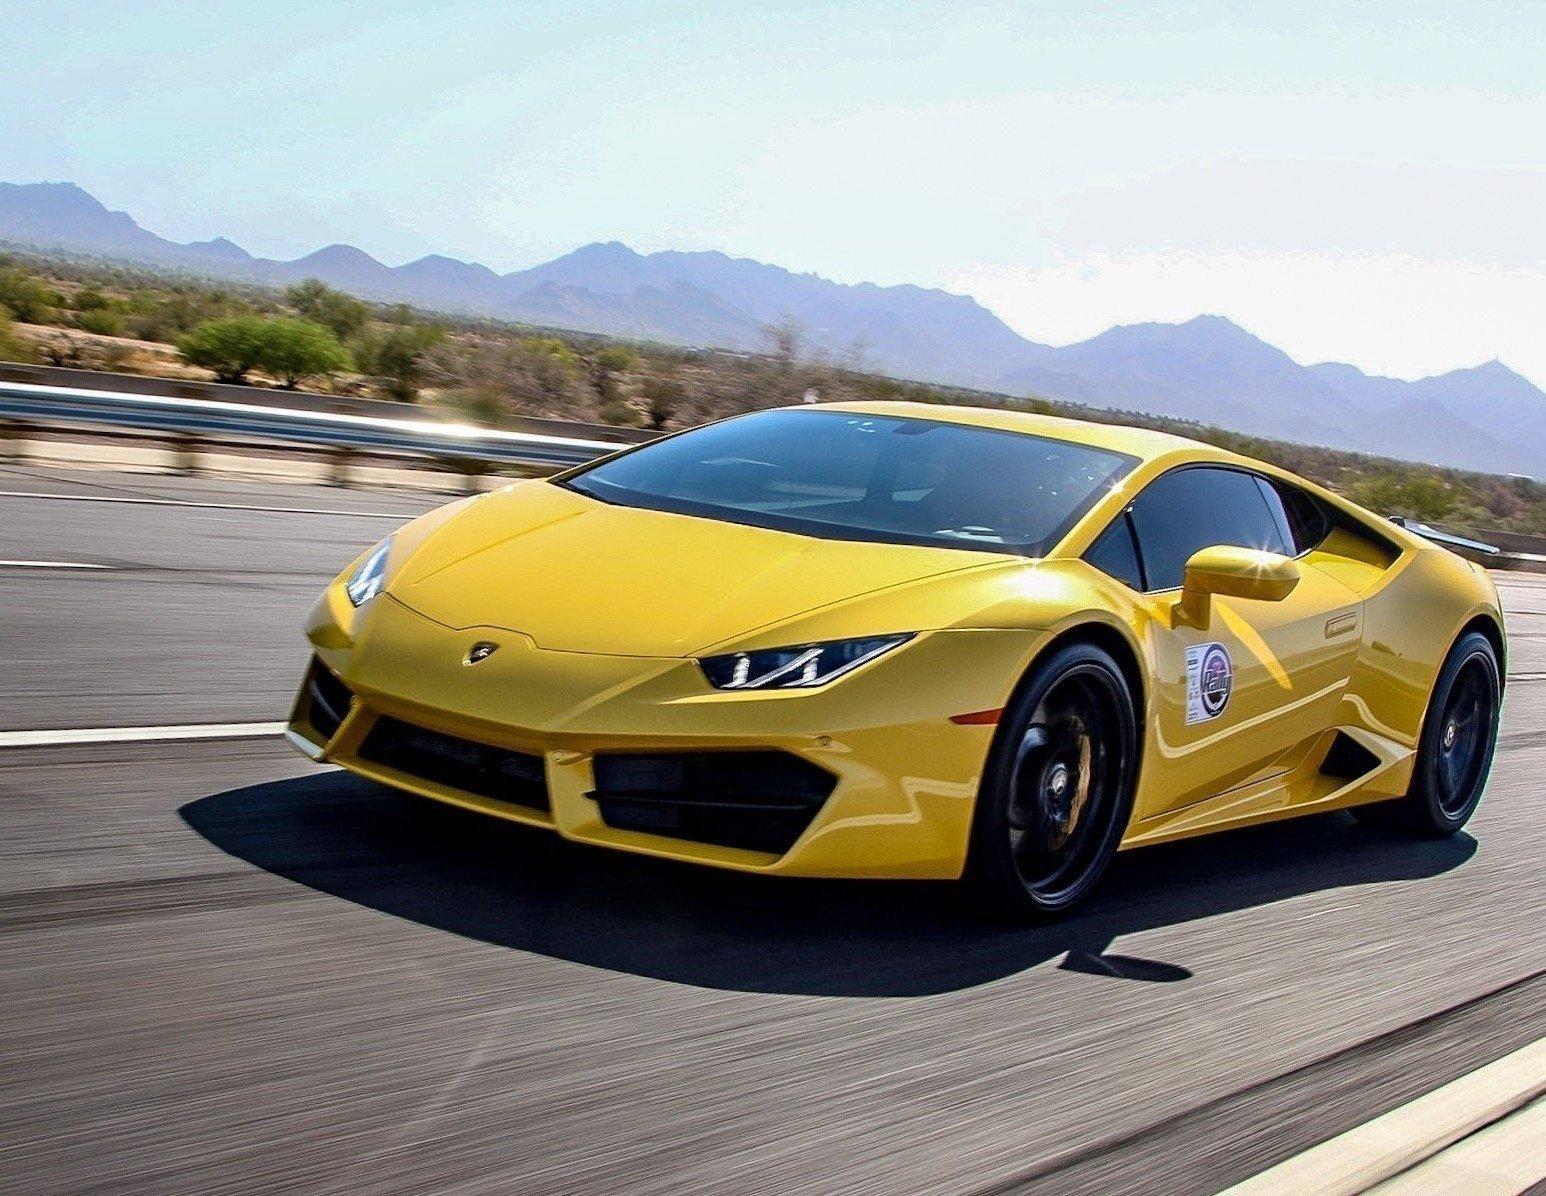 Arizona race track, race tracks in Arizona, luxury car club, apex motorsports, country club race track, private car club